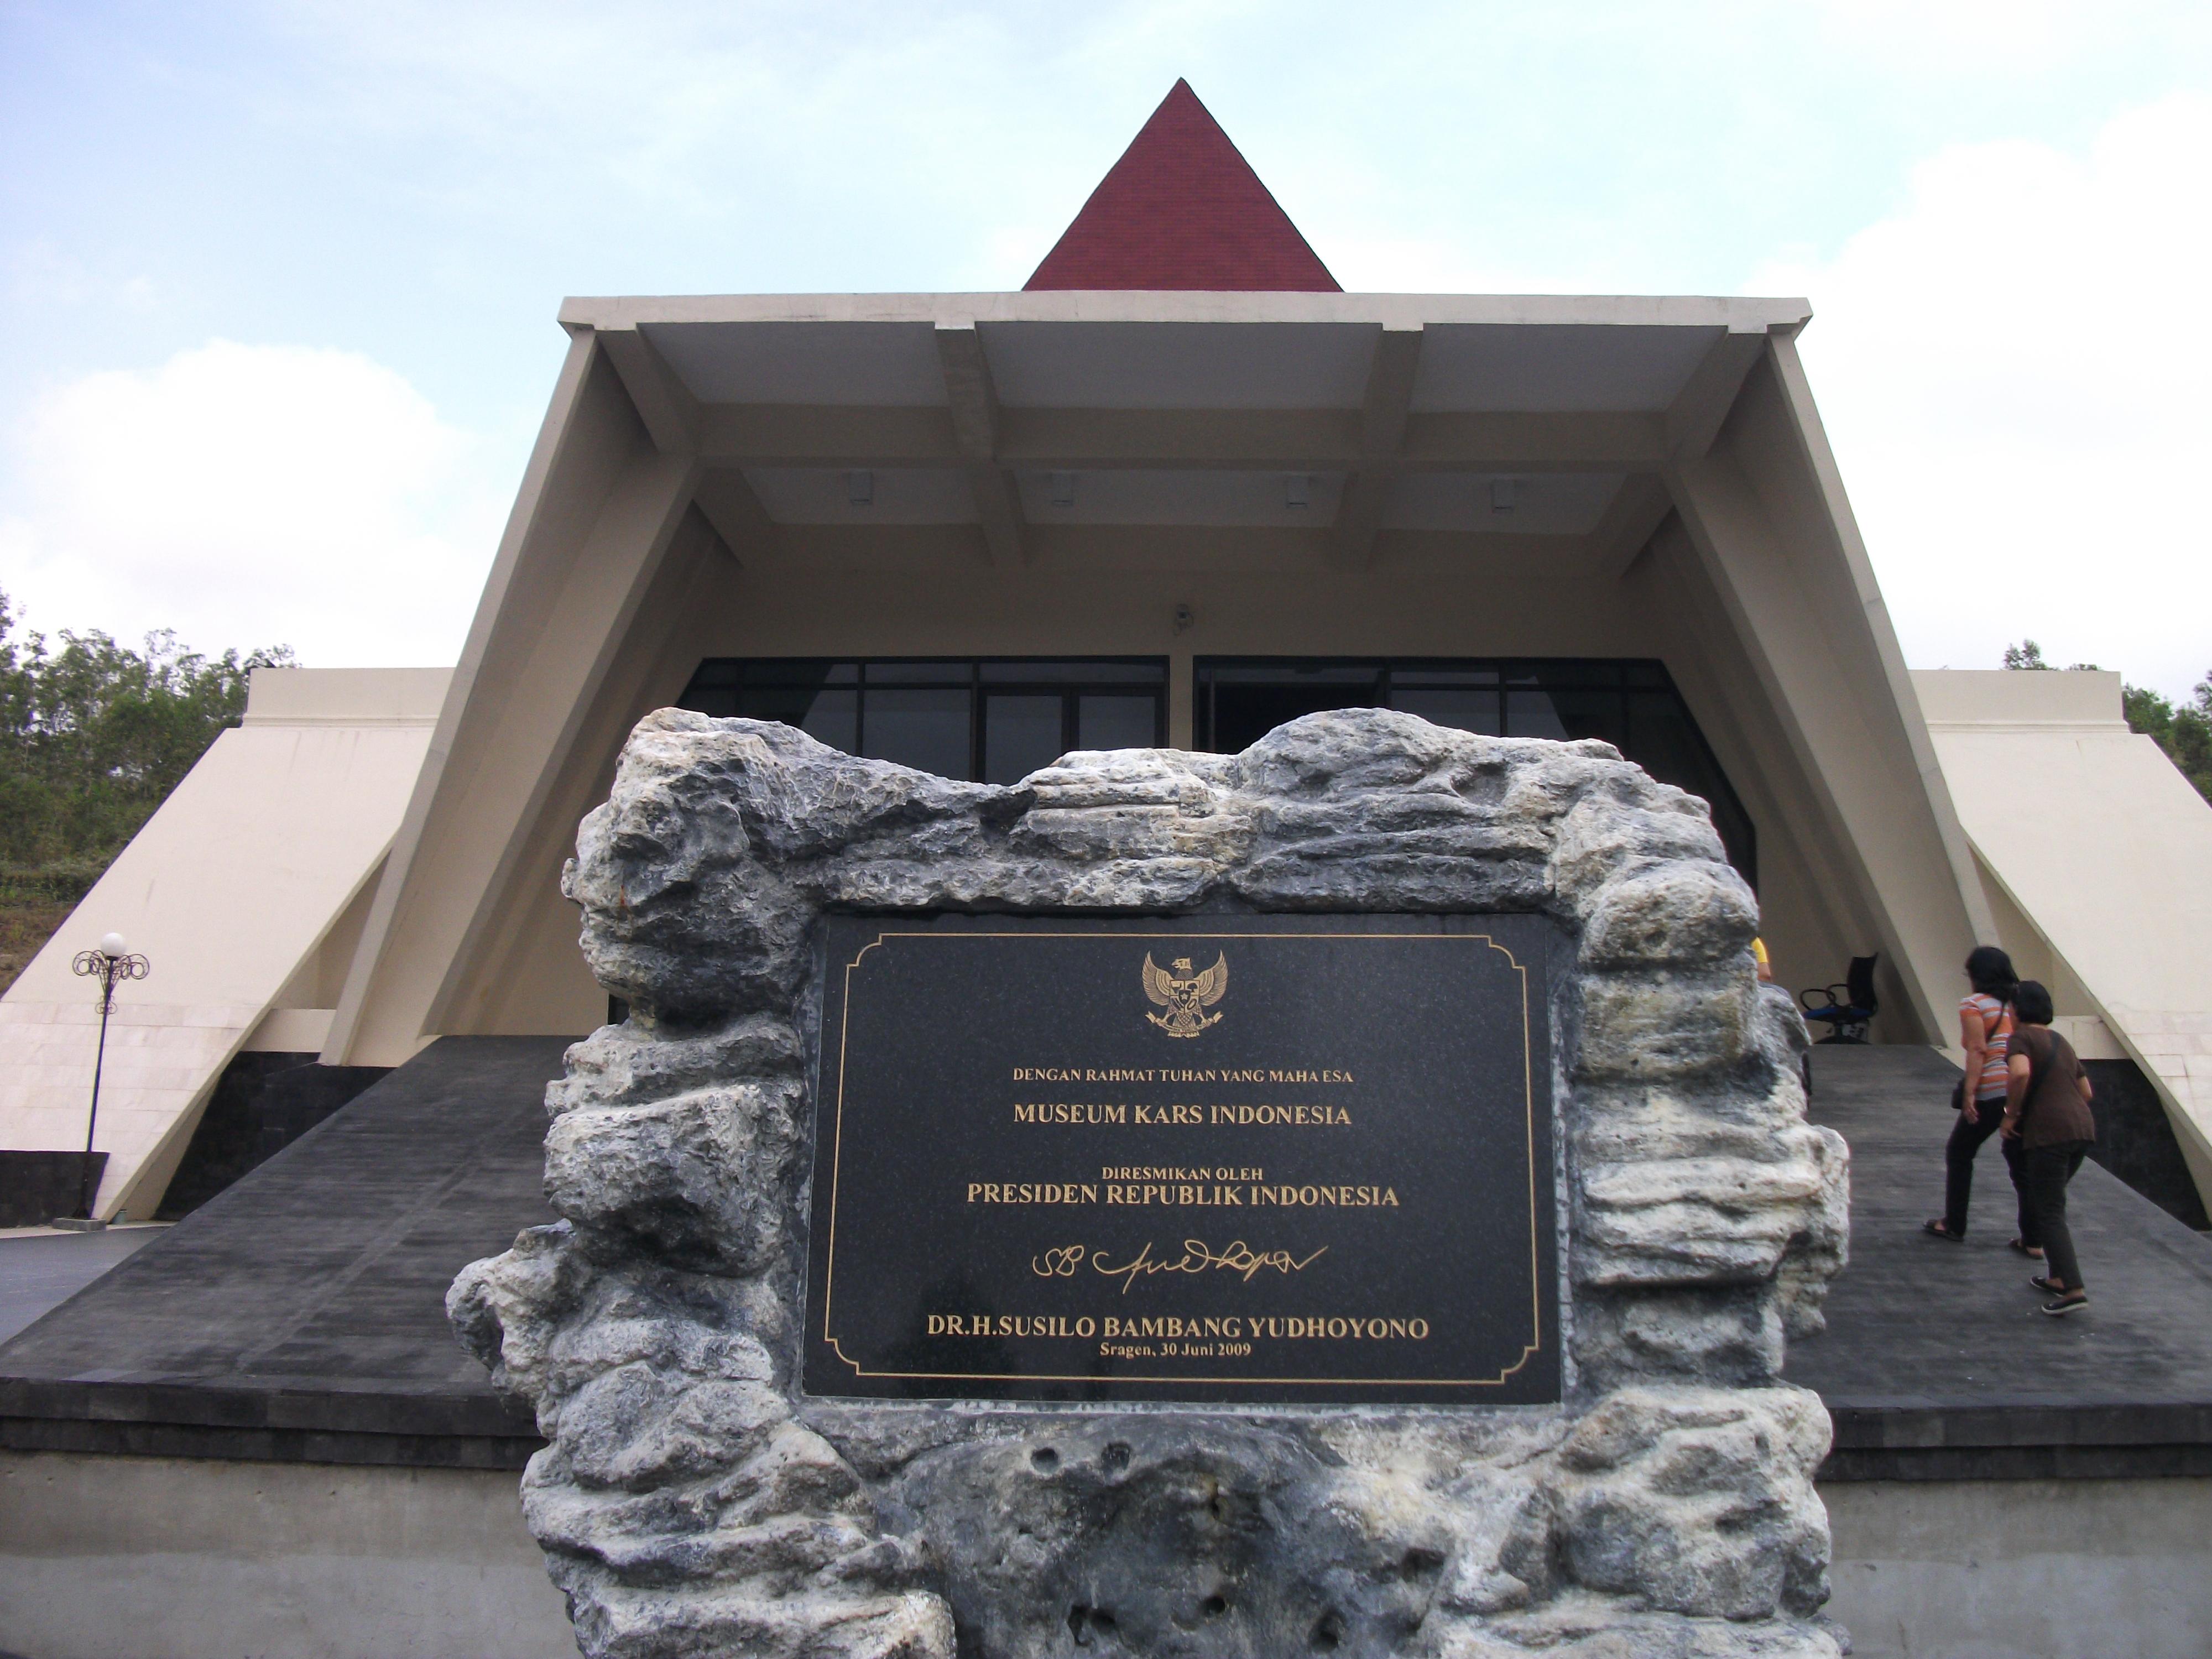 Pesona Kota Gaplek Museum Karst Indonesia Andityadewigha Dunia Kab Wonogiri